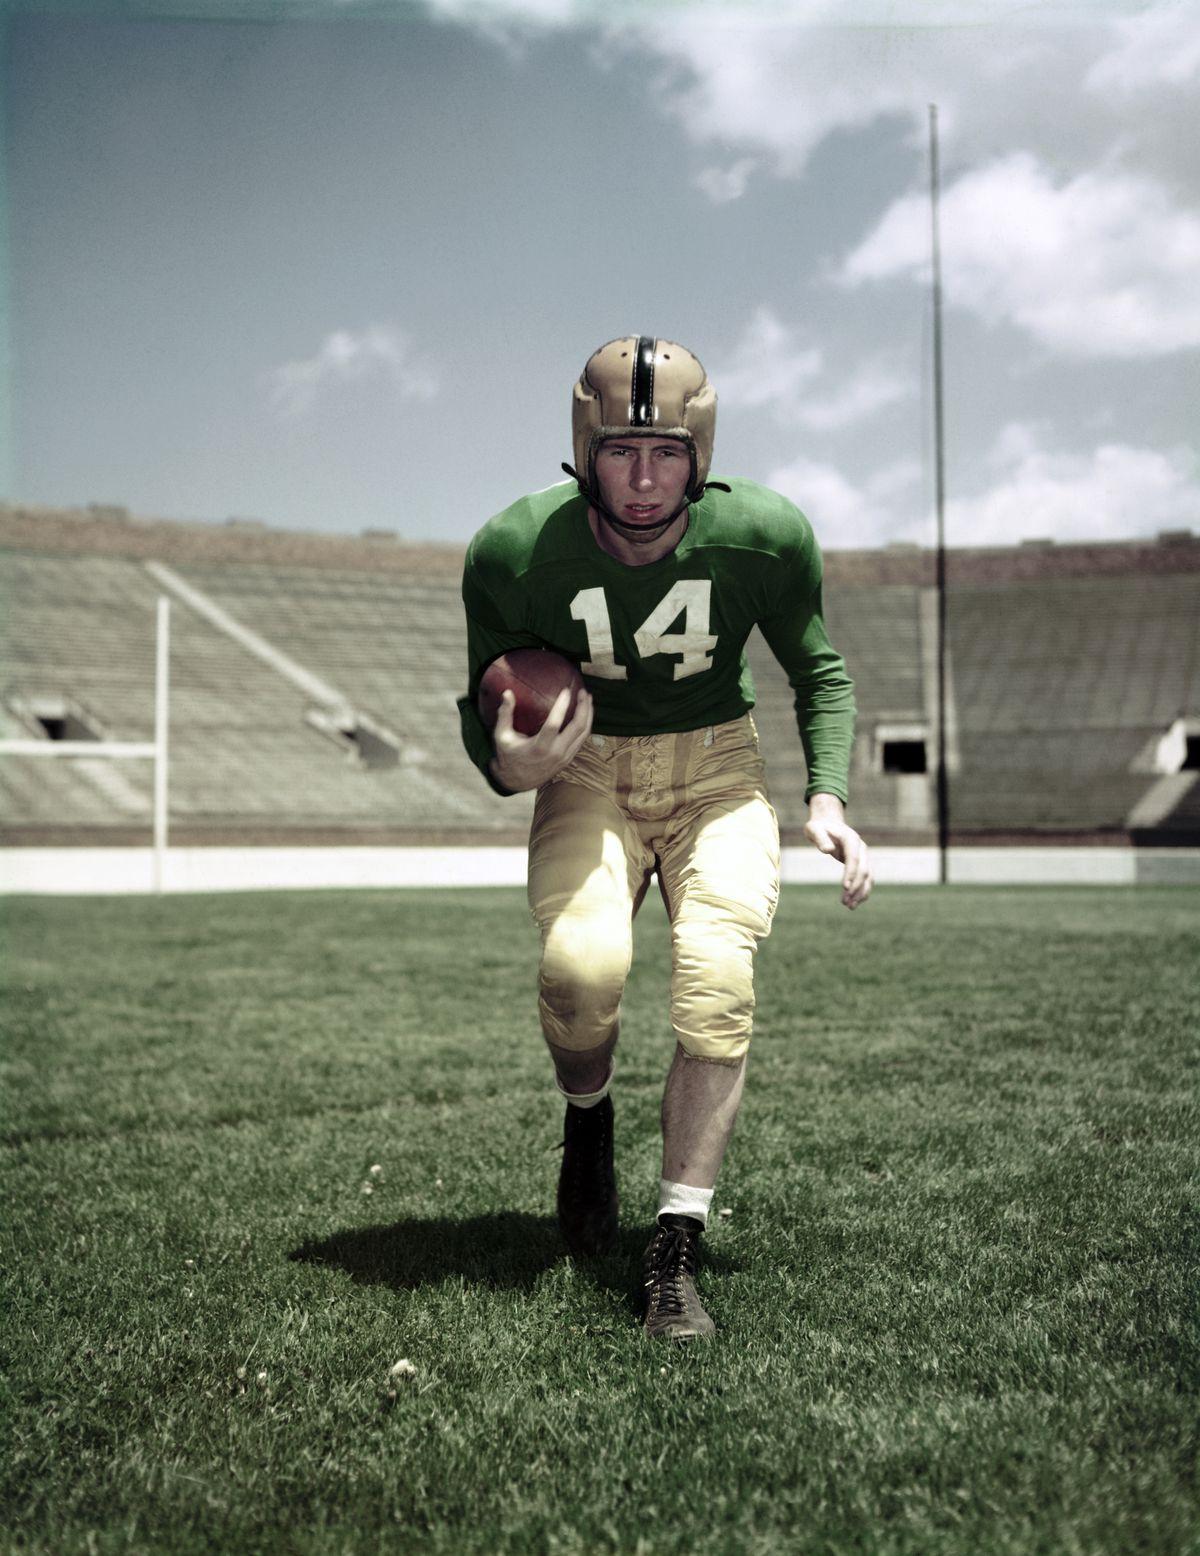 Johnny Lattner Holding Football Under Arm Notre Dame